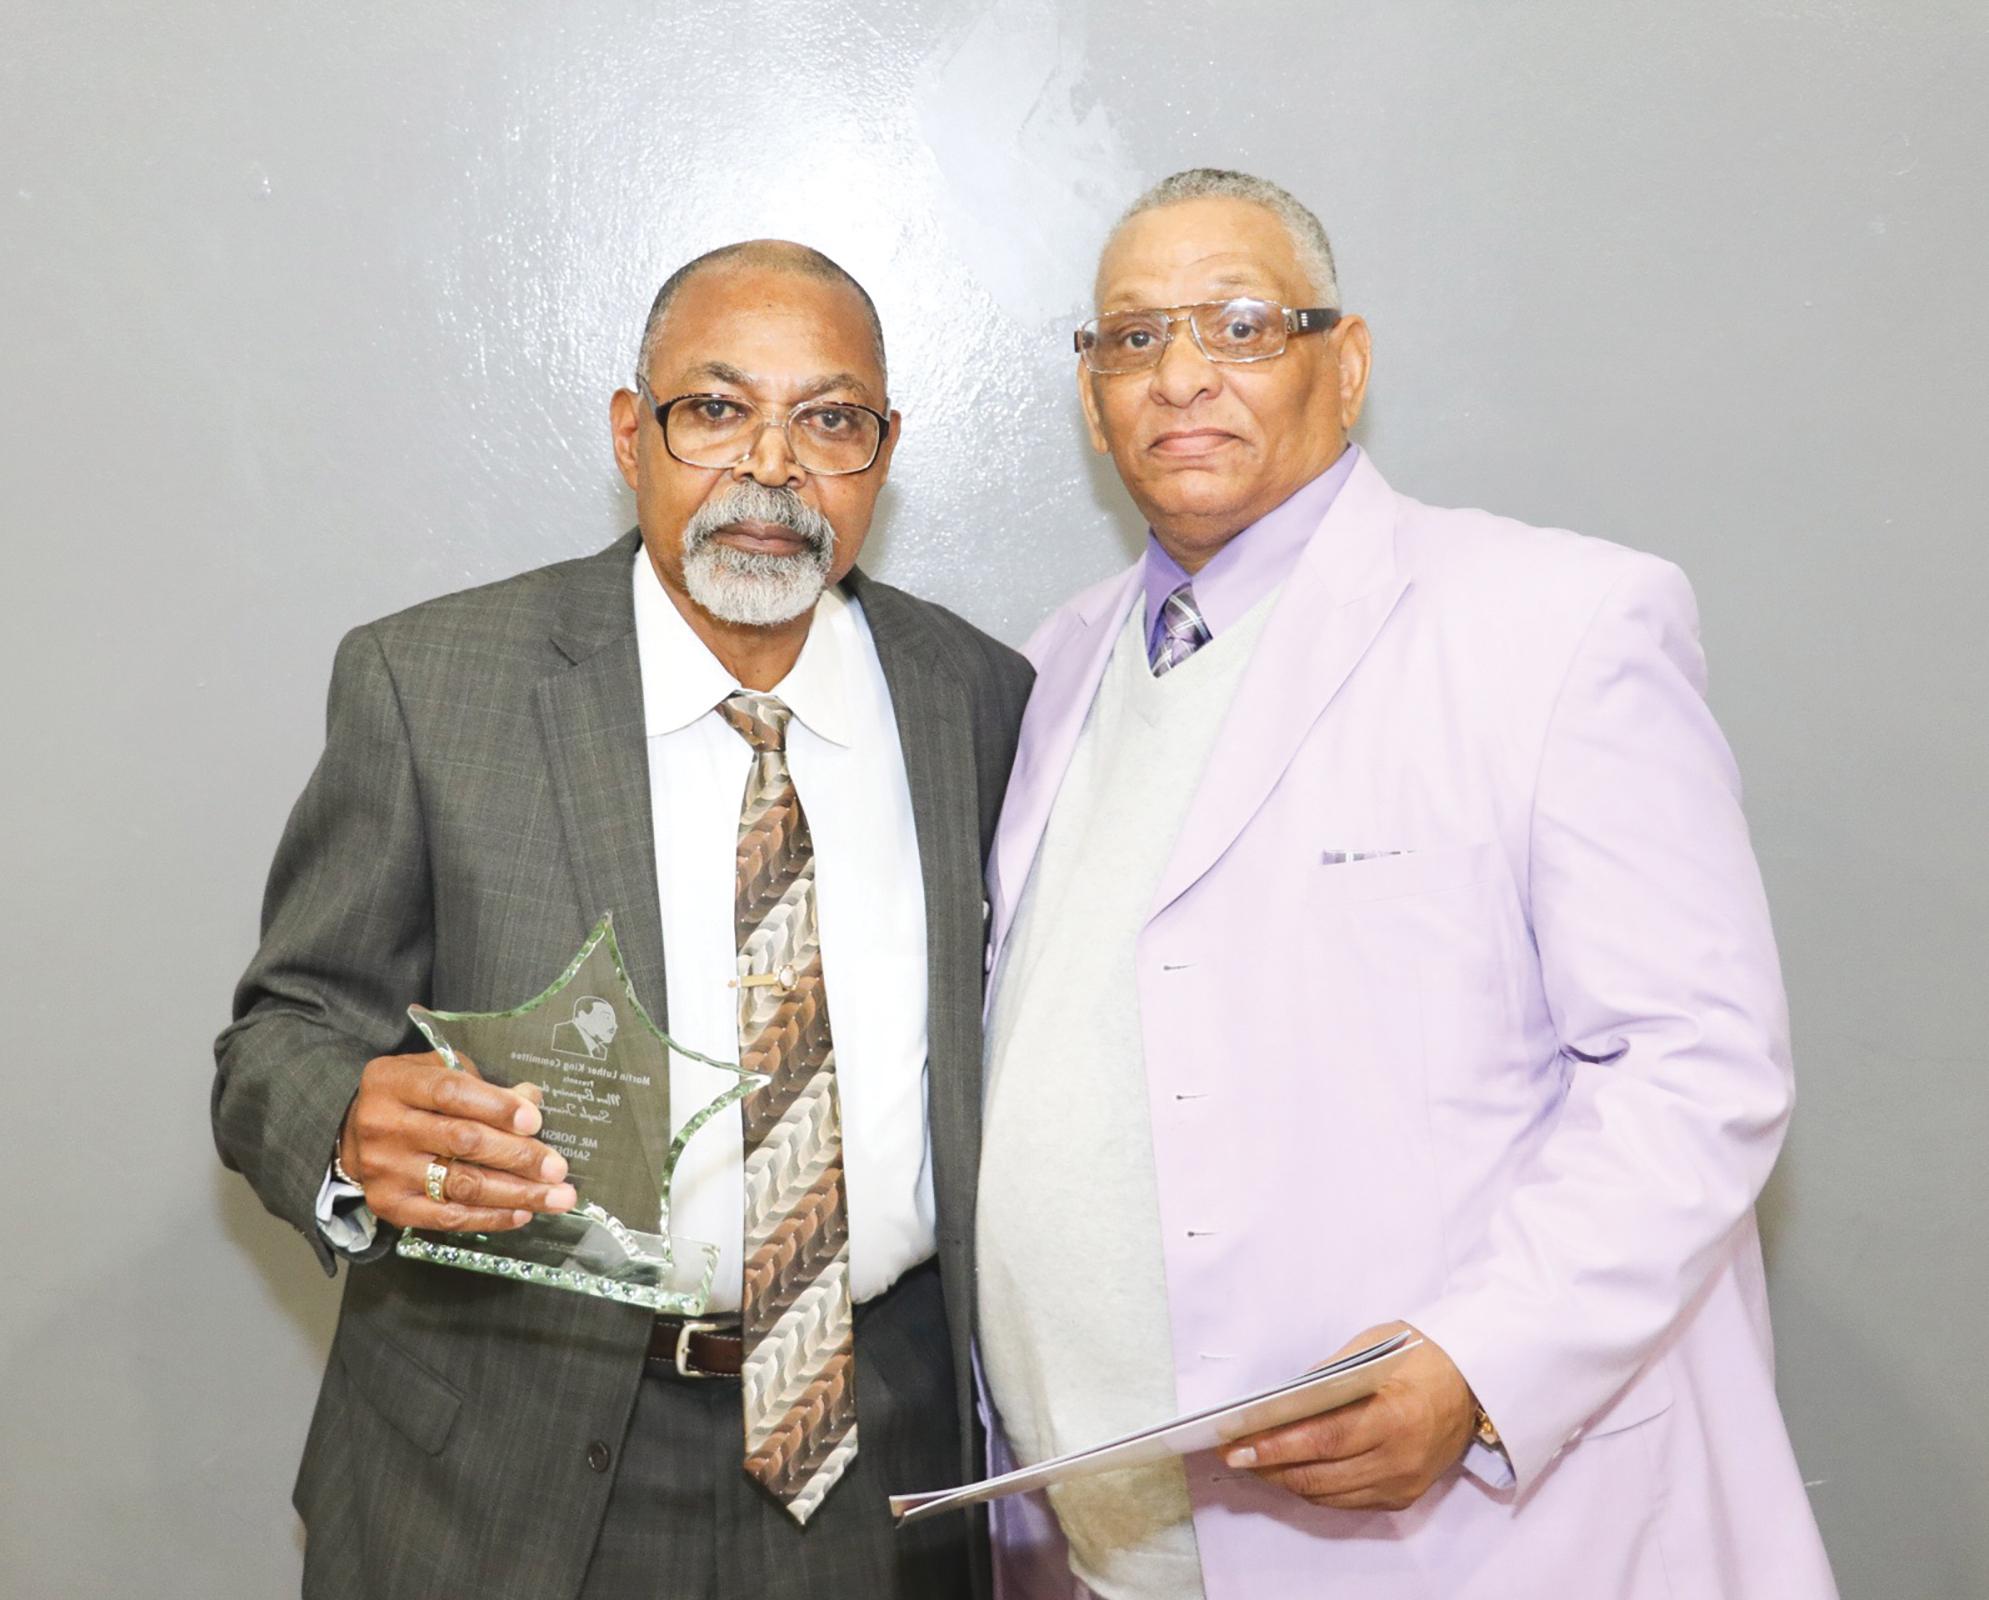 Local Barber Dorsh Sanders (L) accepting the Rev. Martin Luther King Jr. Drumline Major Lifetime Achievement Award. (Carrington Prichett photo)